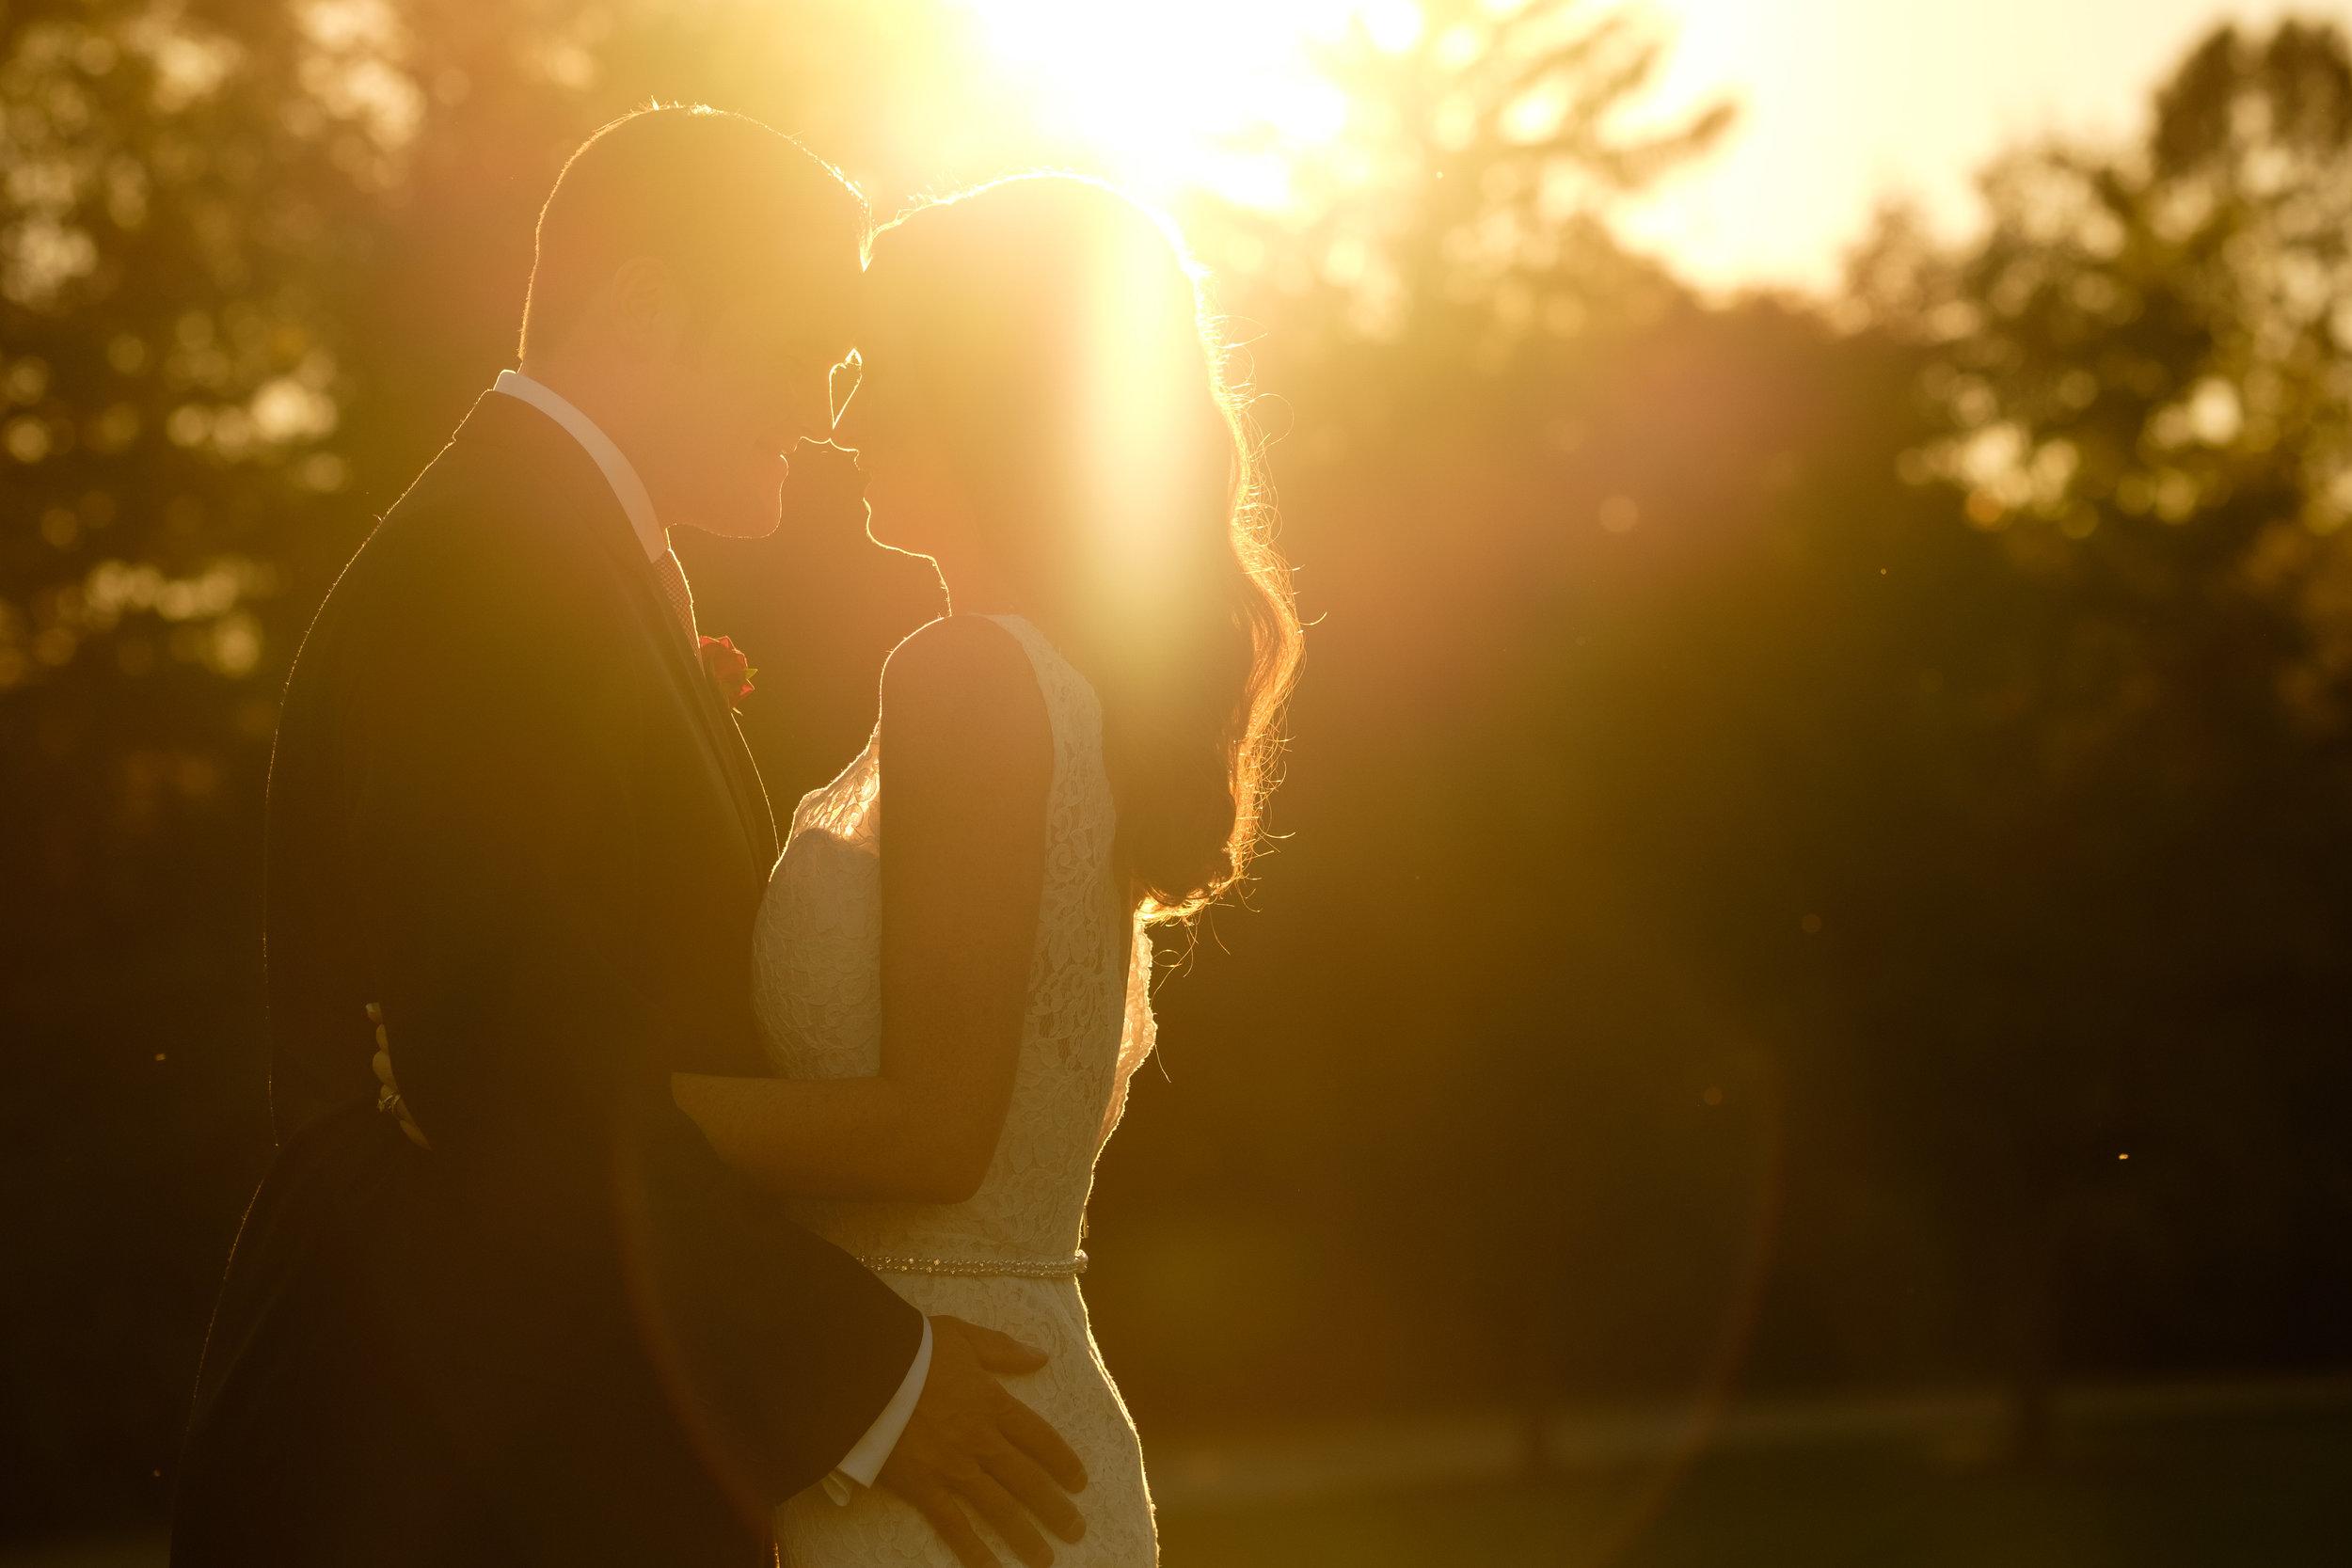 langdon-hall-sunset-wedding-portrait.JPG